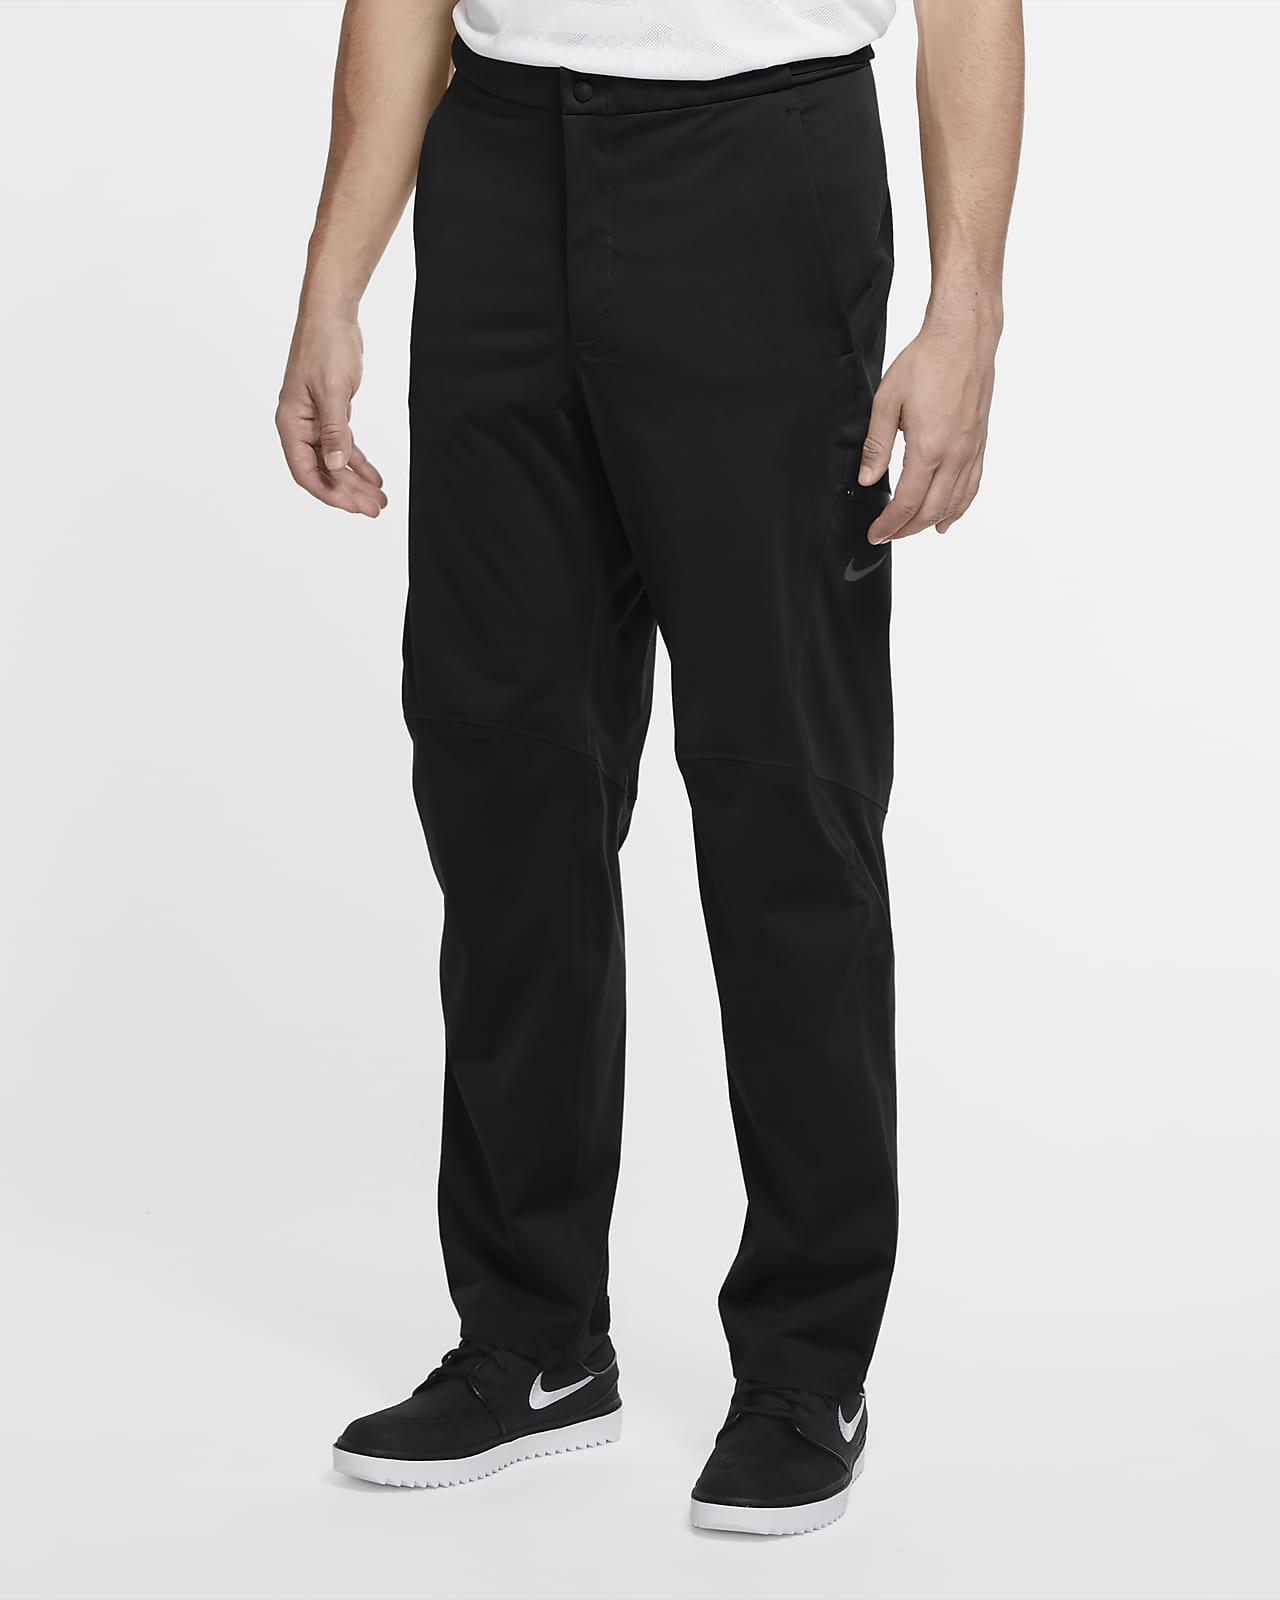 Pantalon de golf Nike HyperShield pour Homme